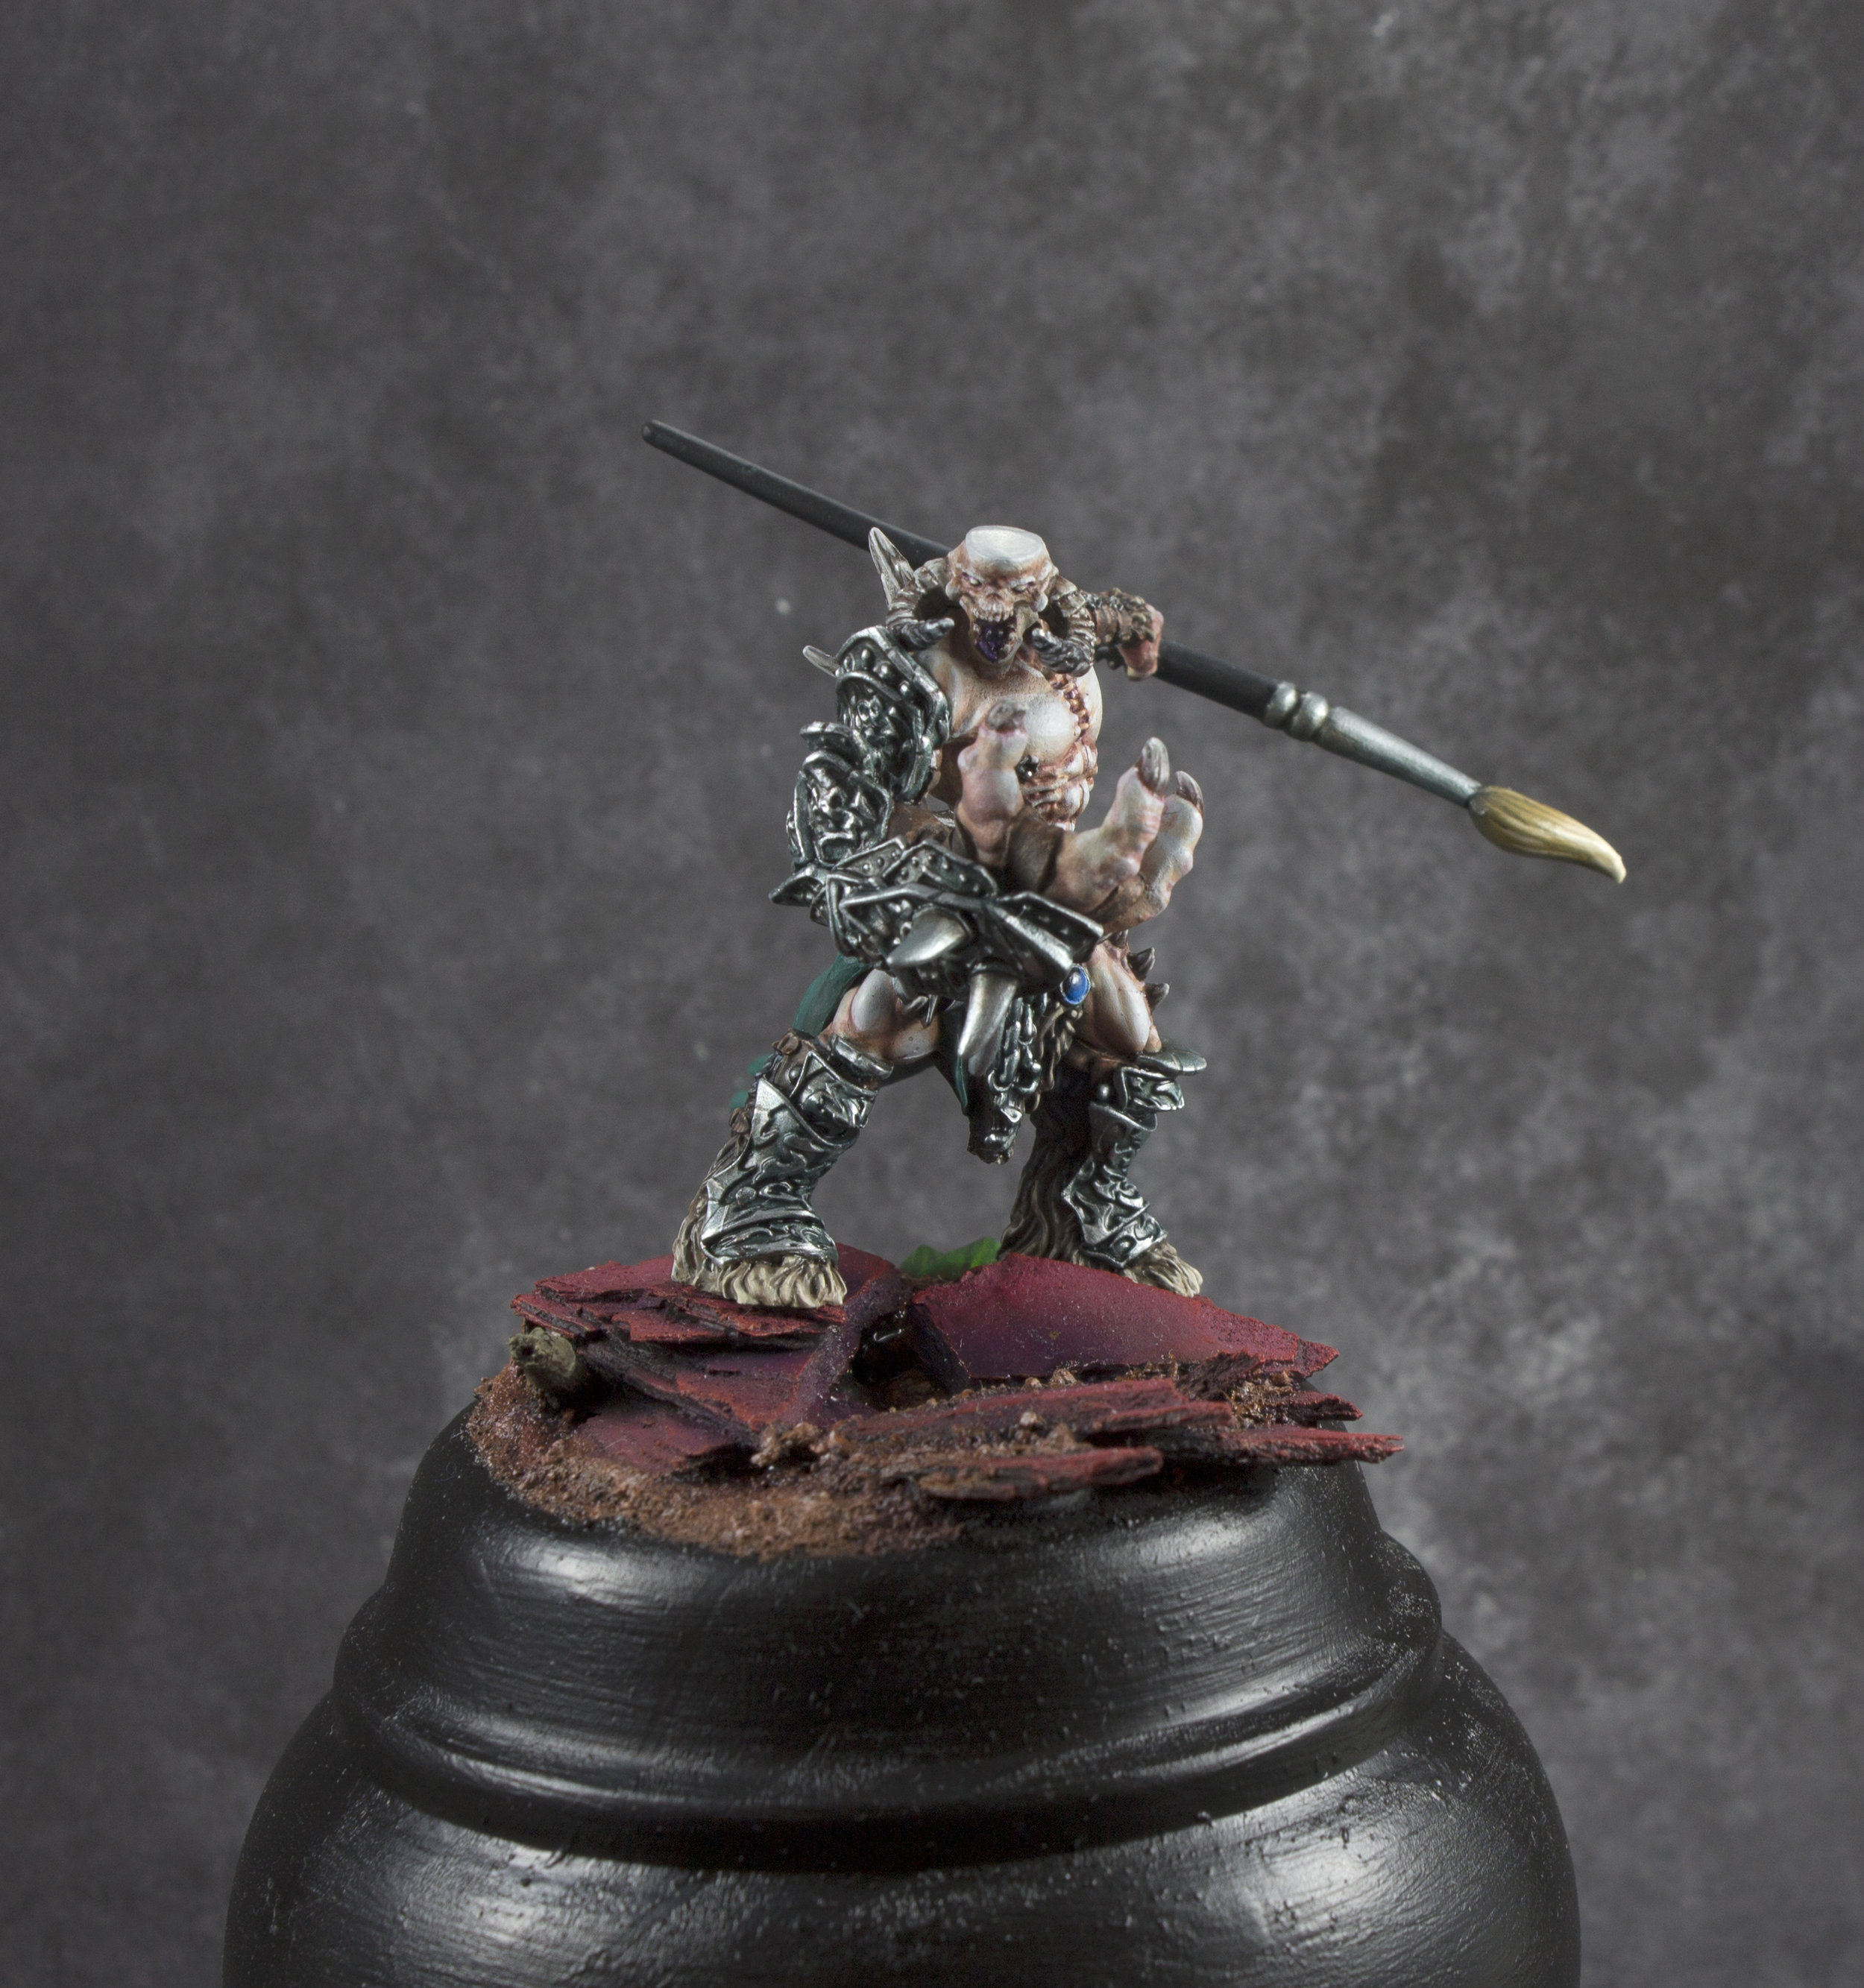 Thagrosh the Painter